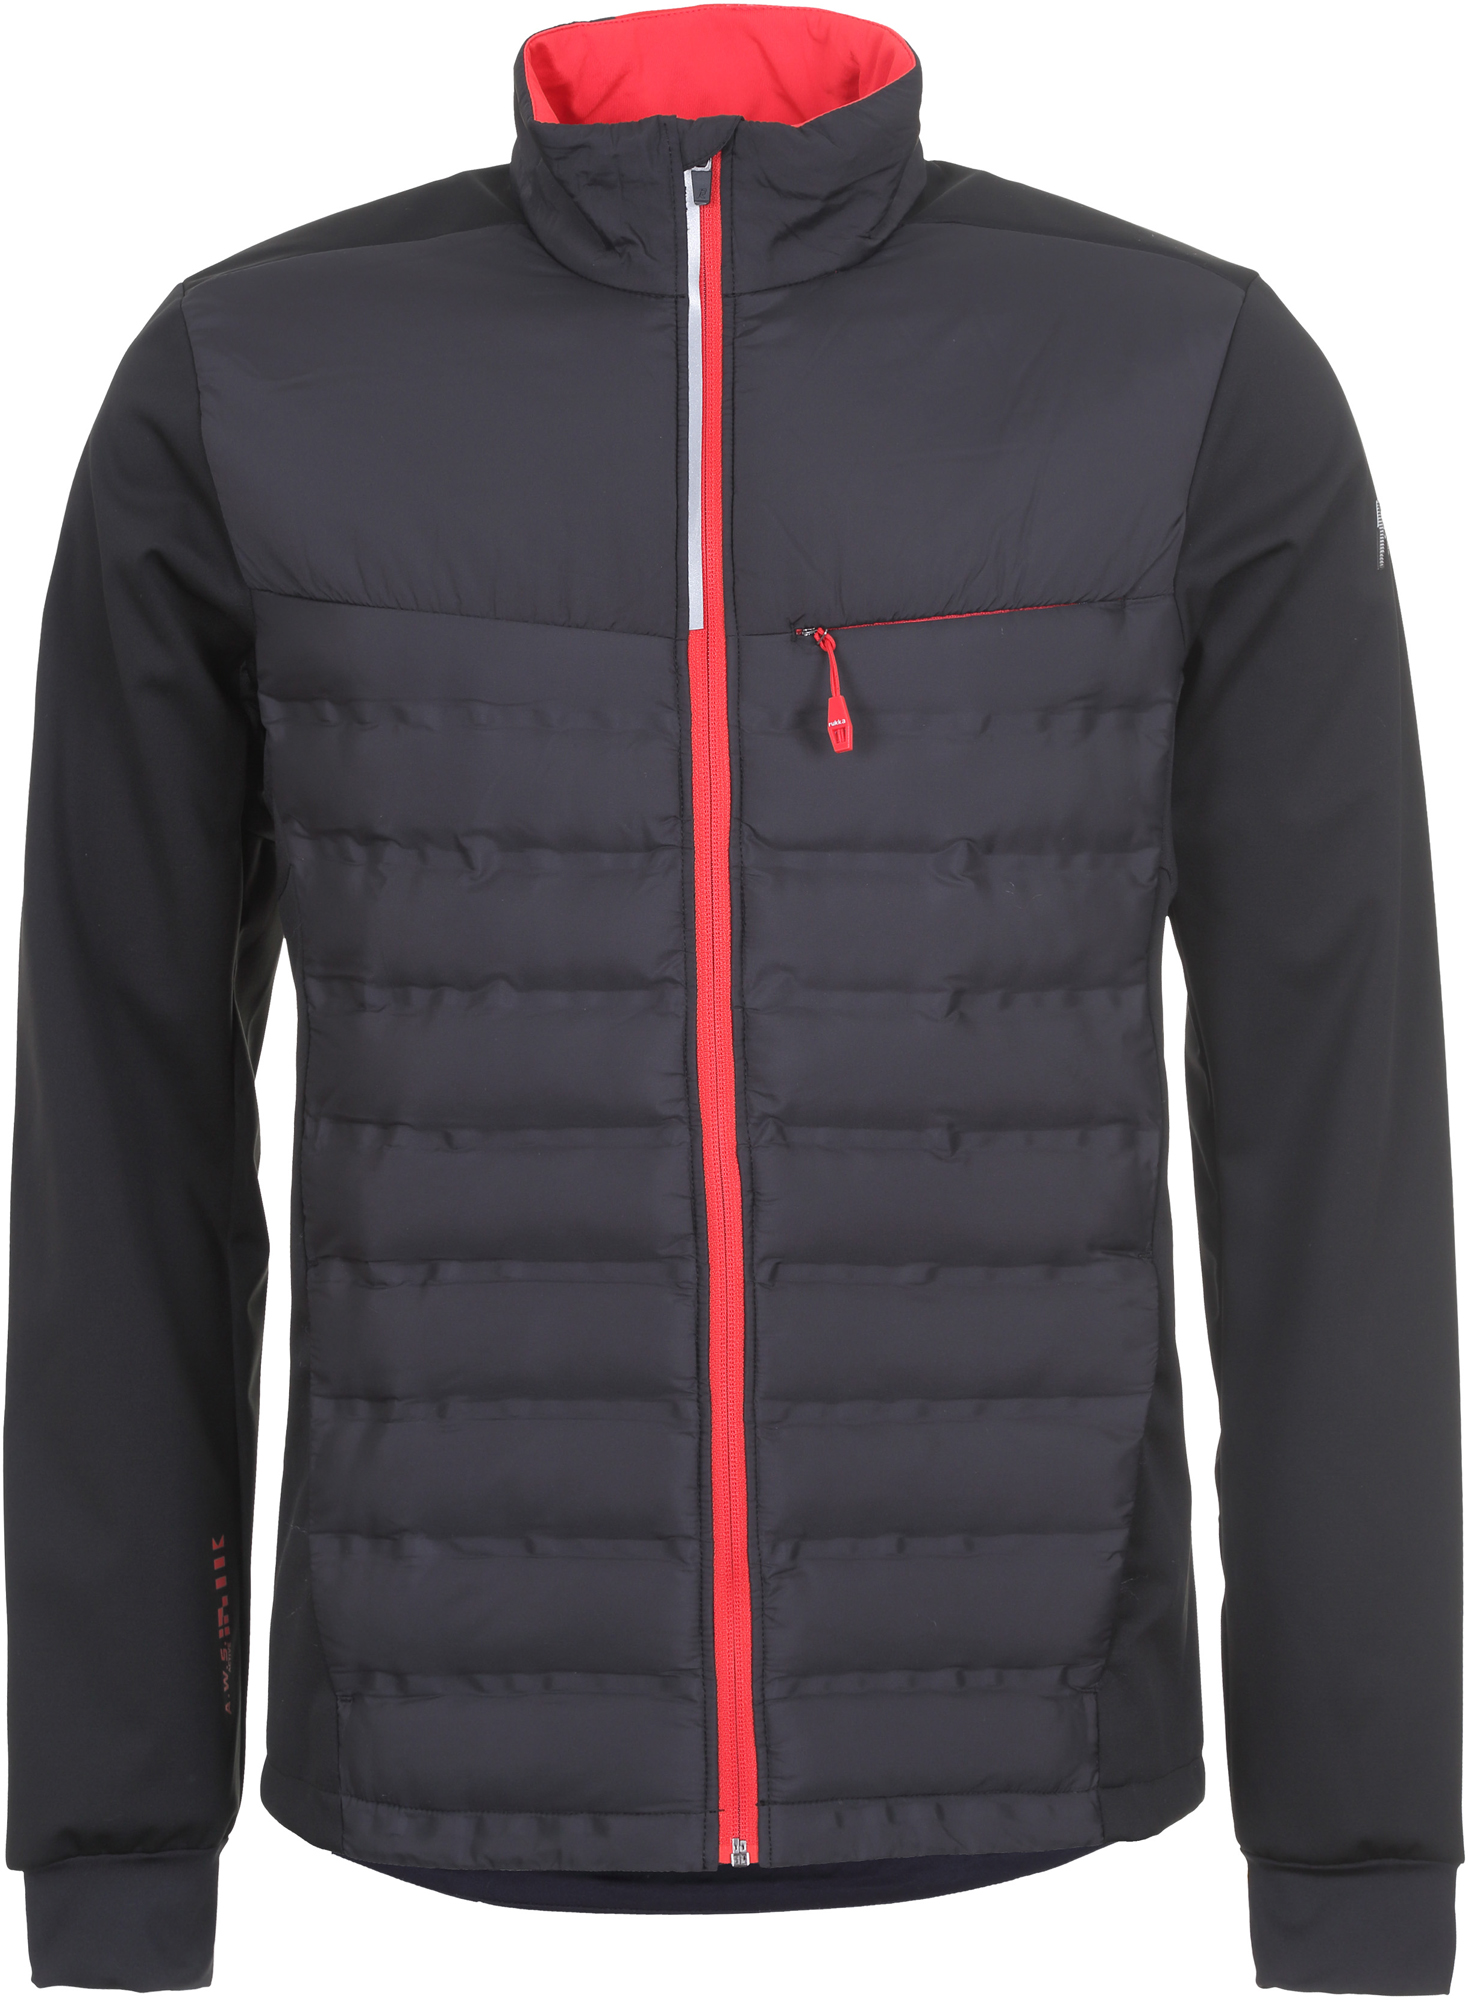 Rukka Куртка утепленная мужская Taskila, размер 52-54